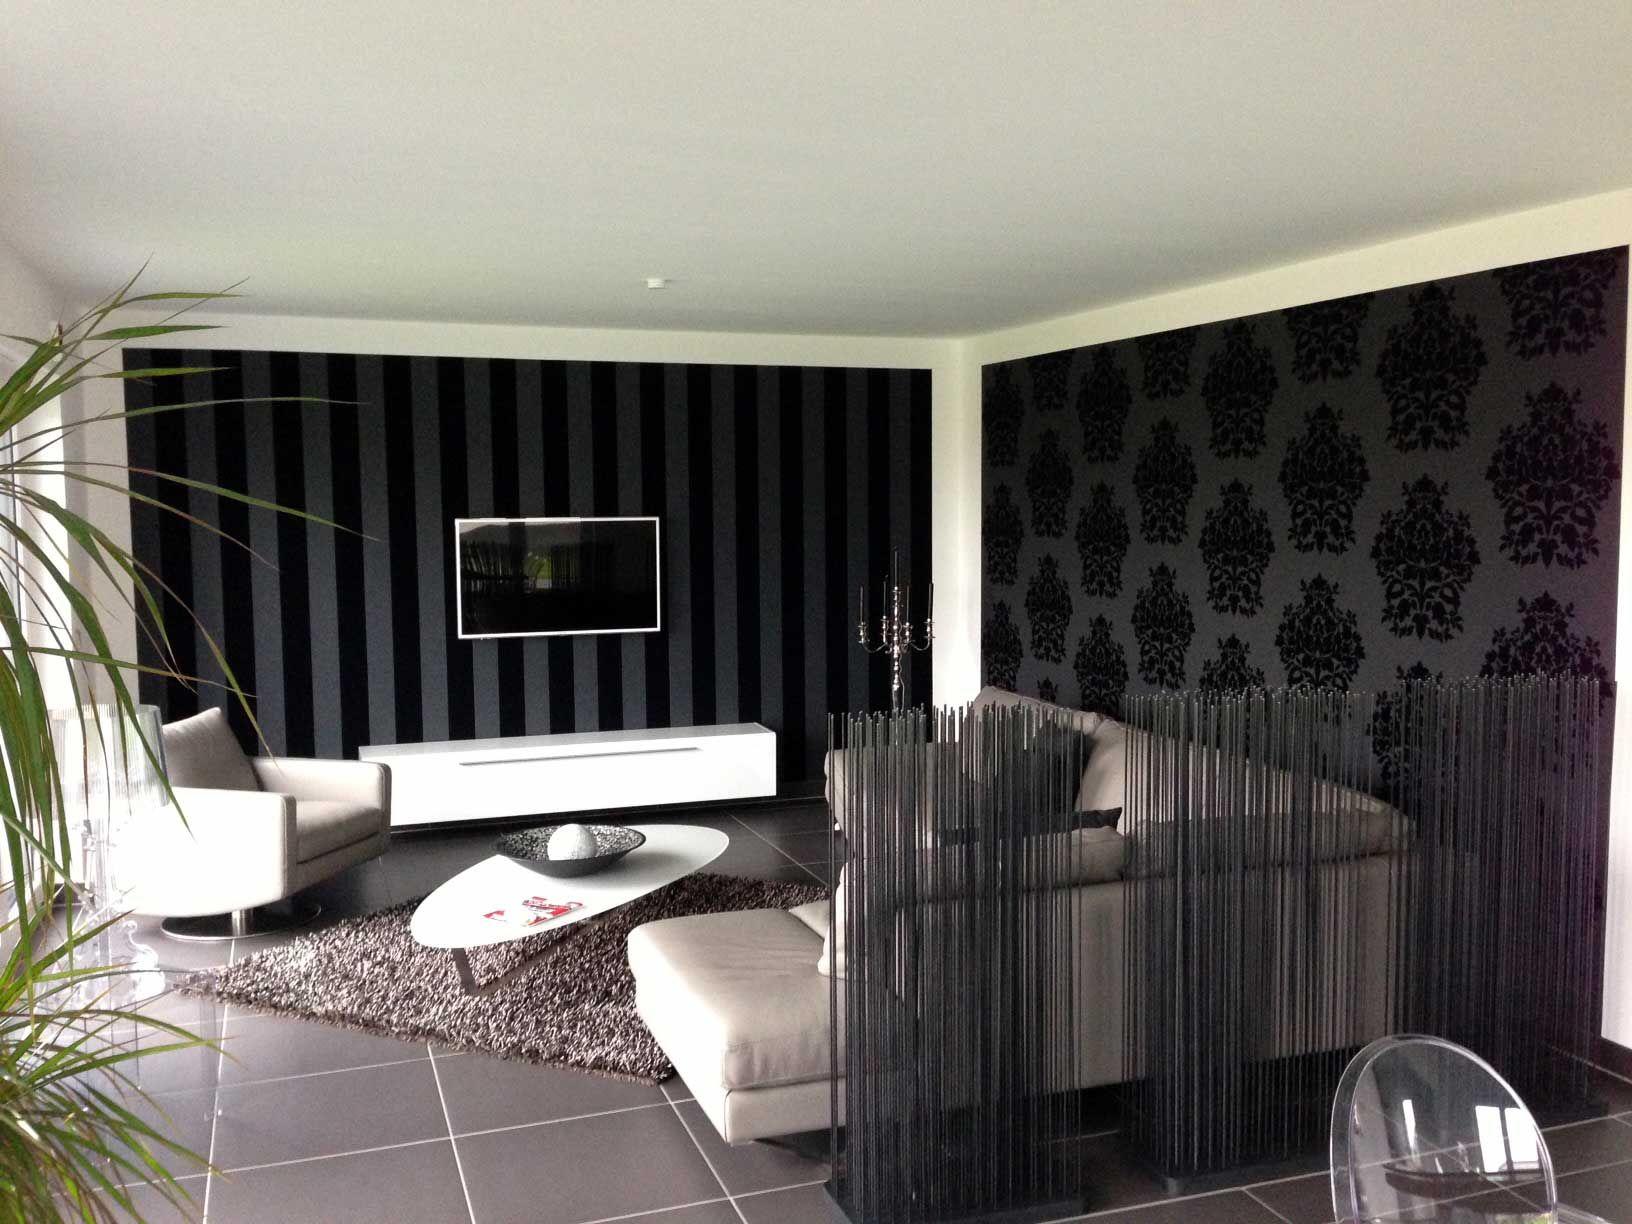 tapeten wohnzimmer ideen | jtleigh - hausgestaltung ideen, Moderne deko